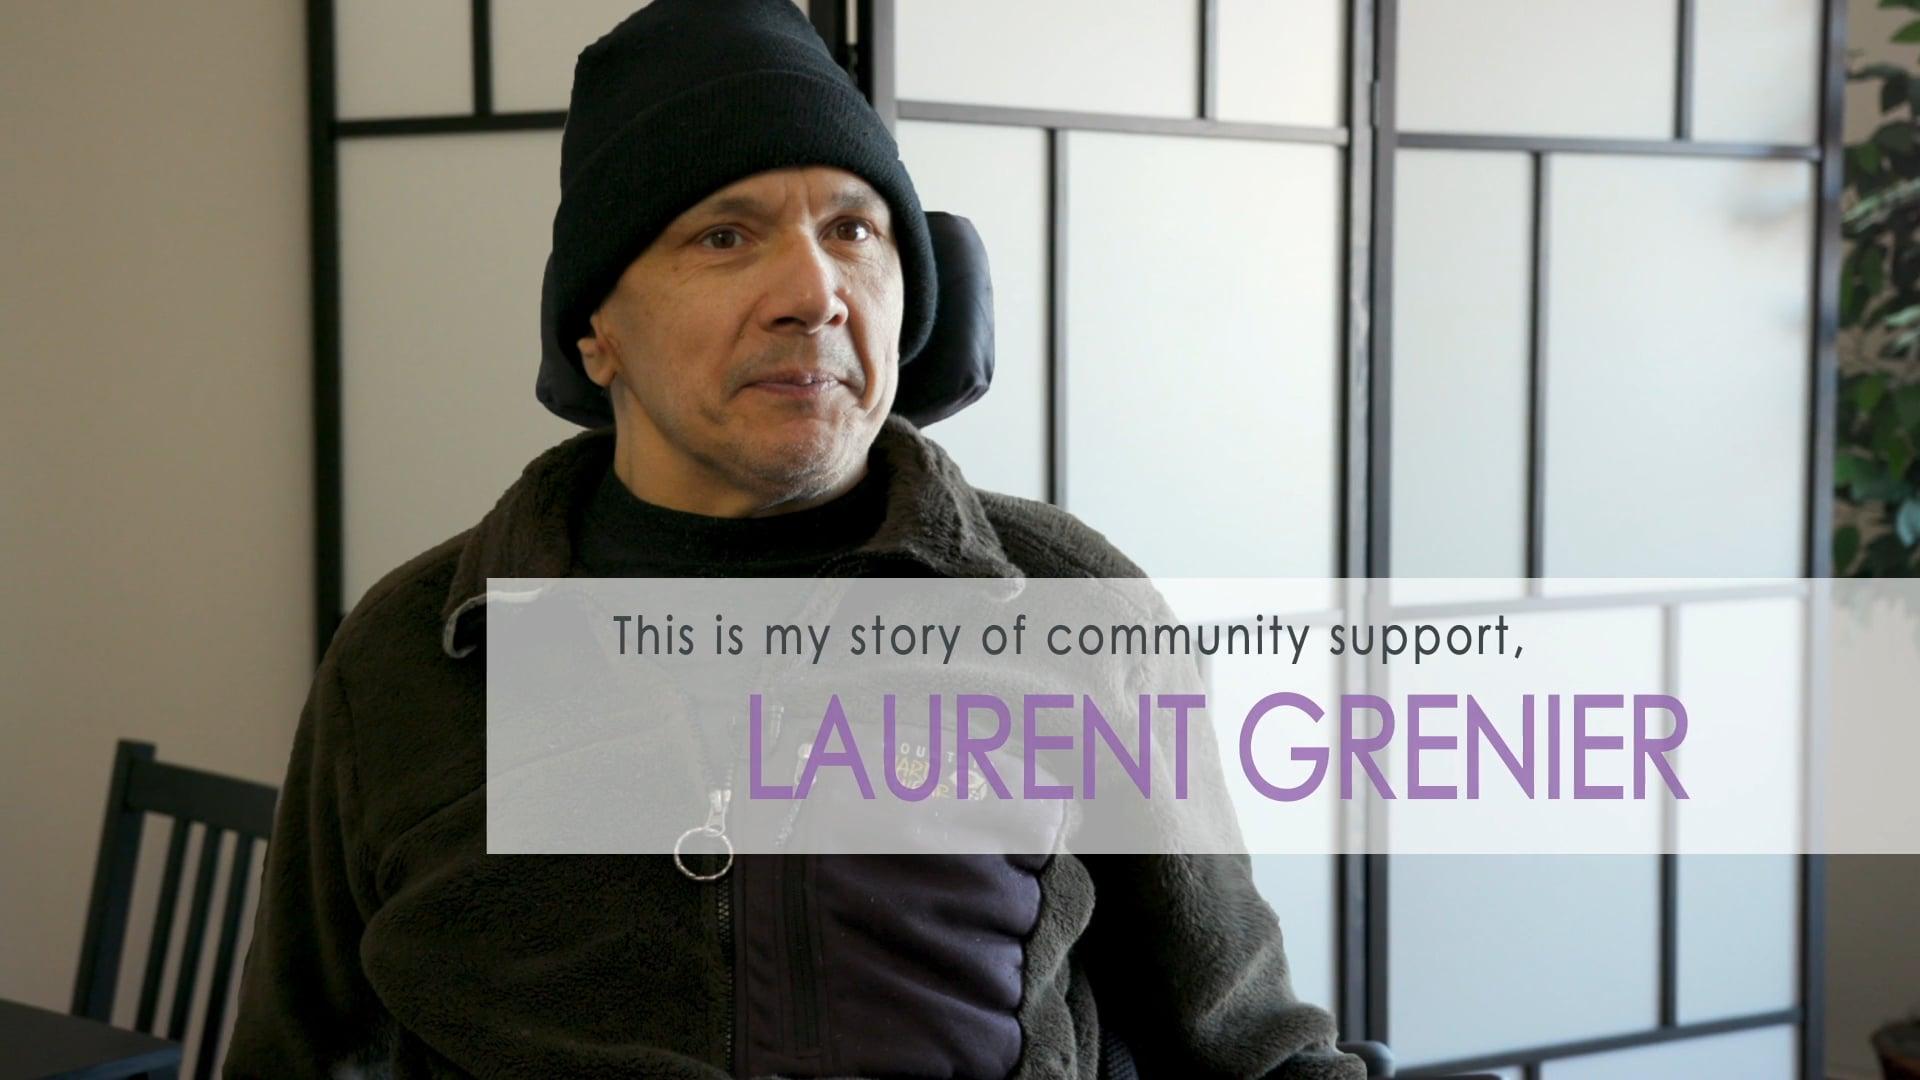 Laurent's Story